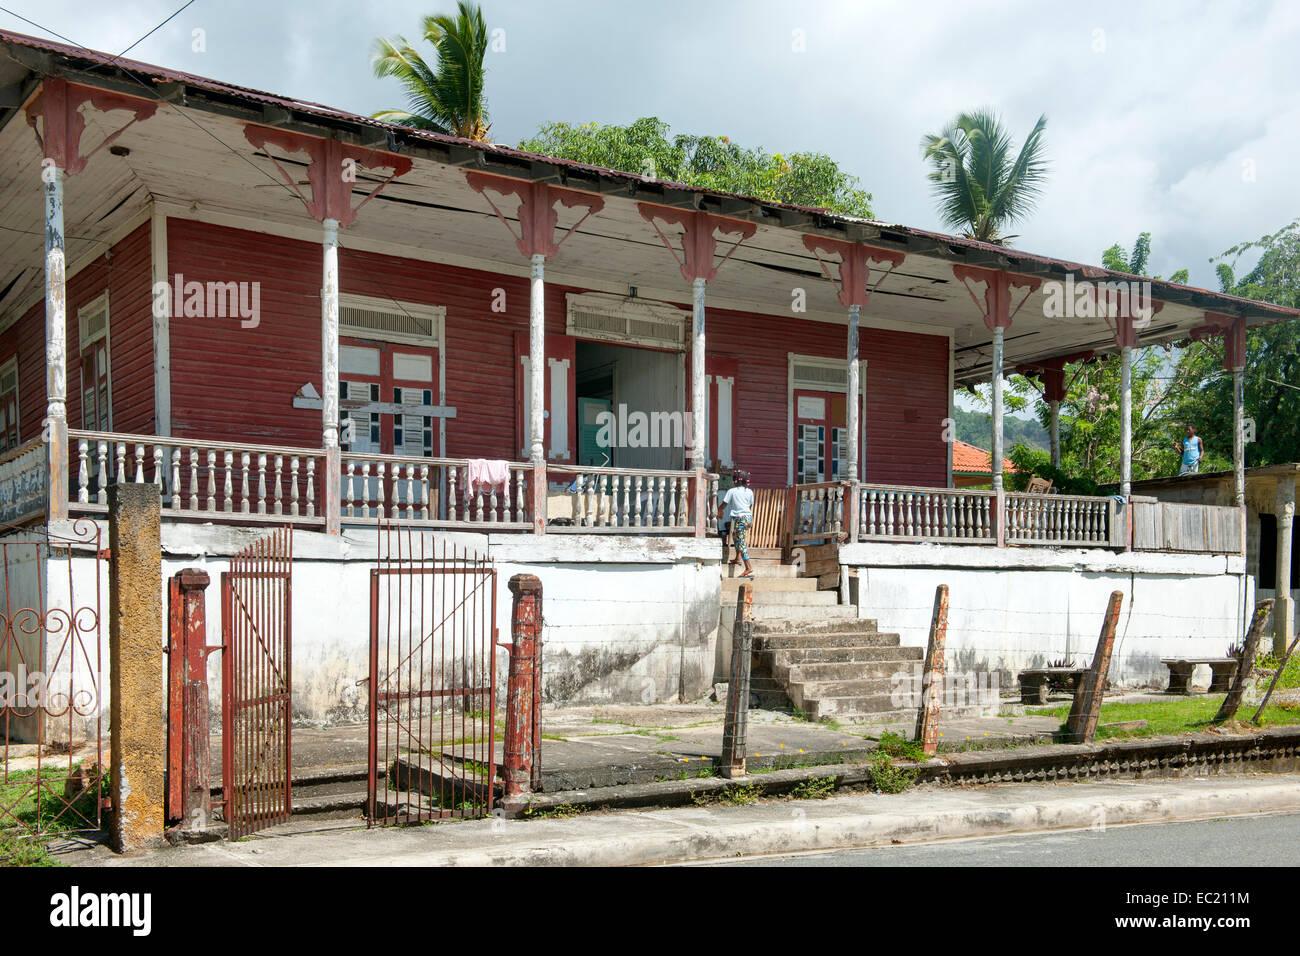 Dominikanische Republik, Halbinsel Samana, Sanchez - Stock Image